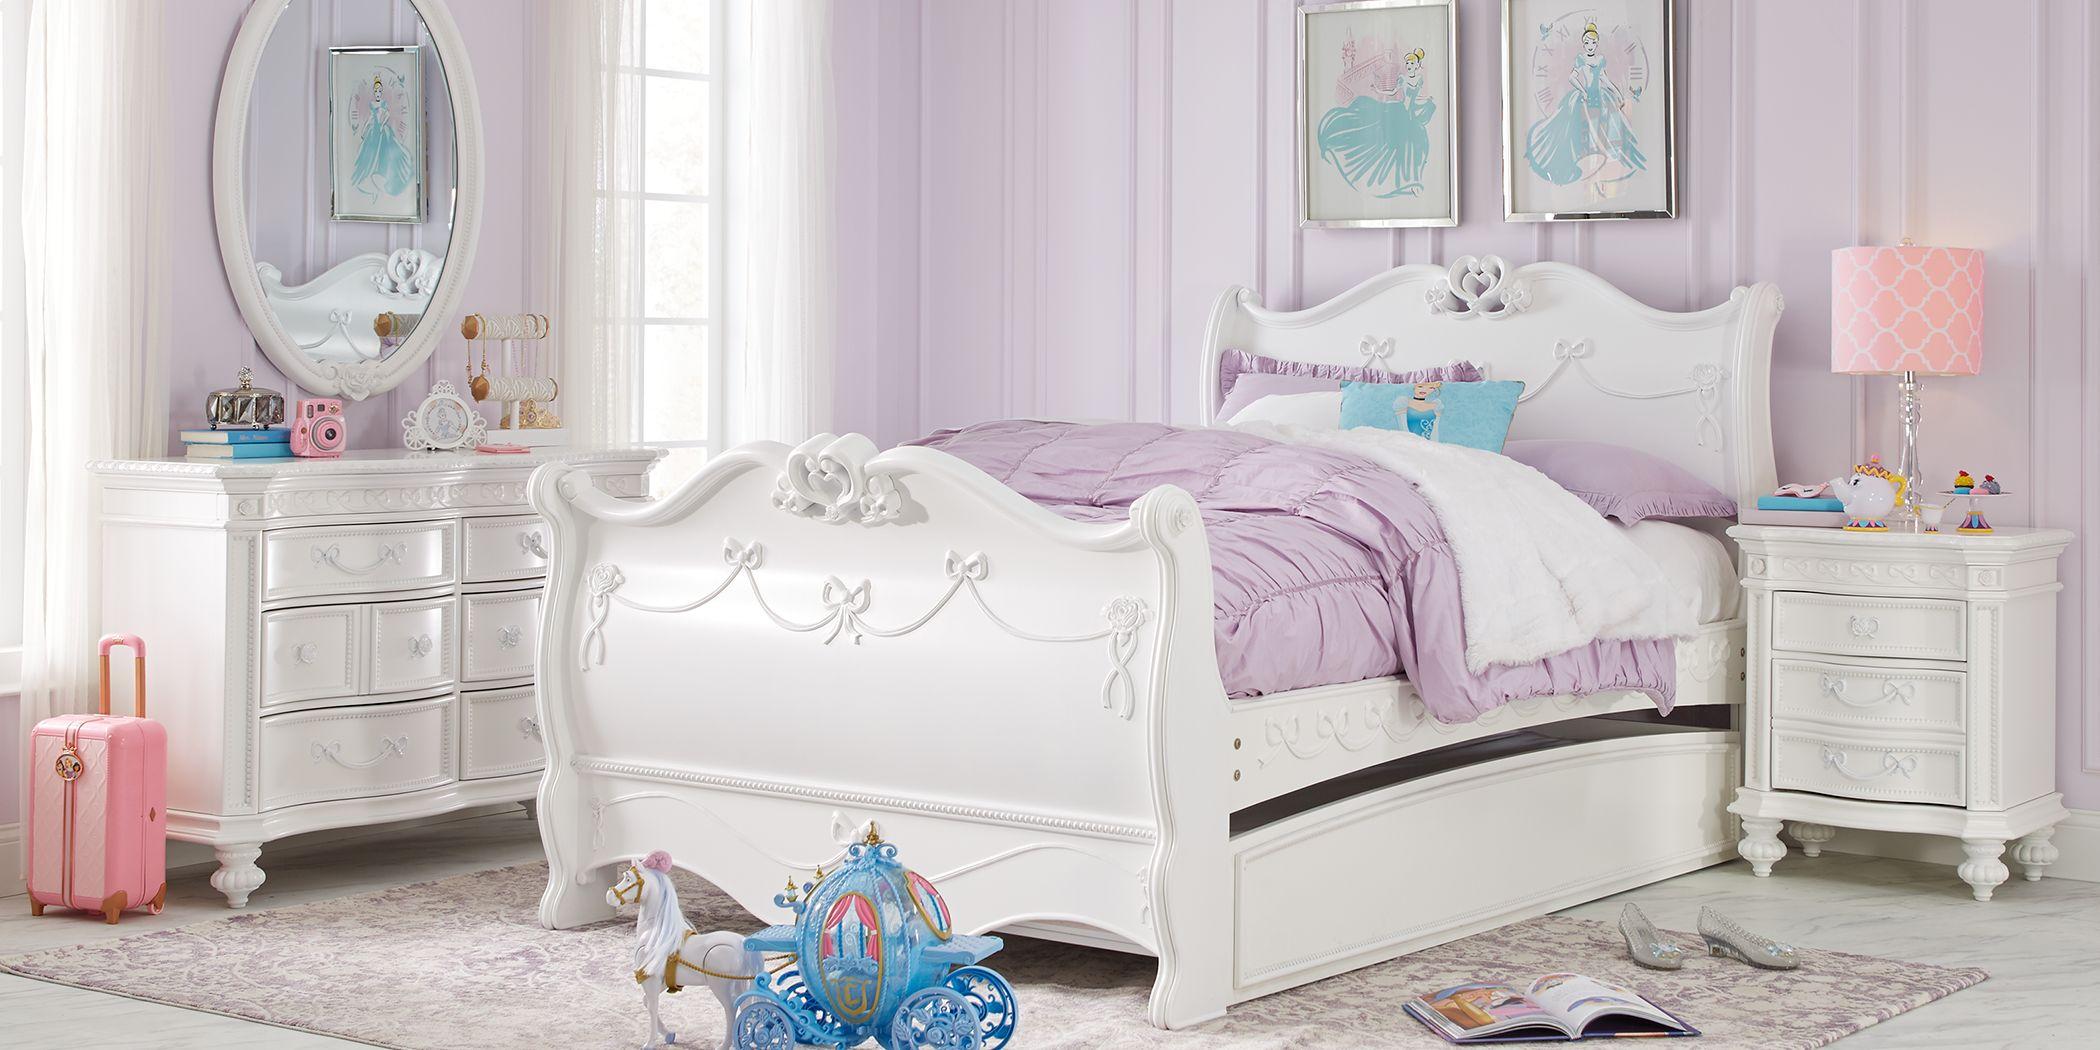 Disney Princess Fairytale White 5 Pc Twin Sleigh Bedroom